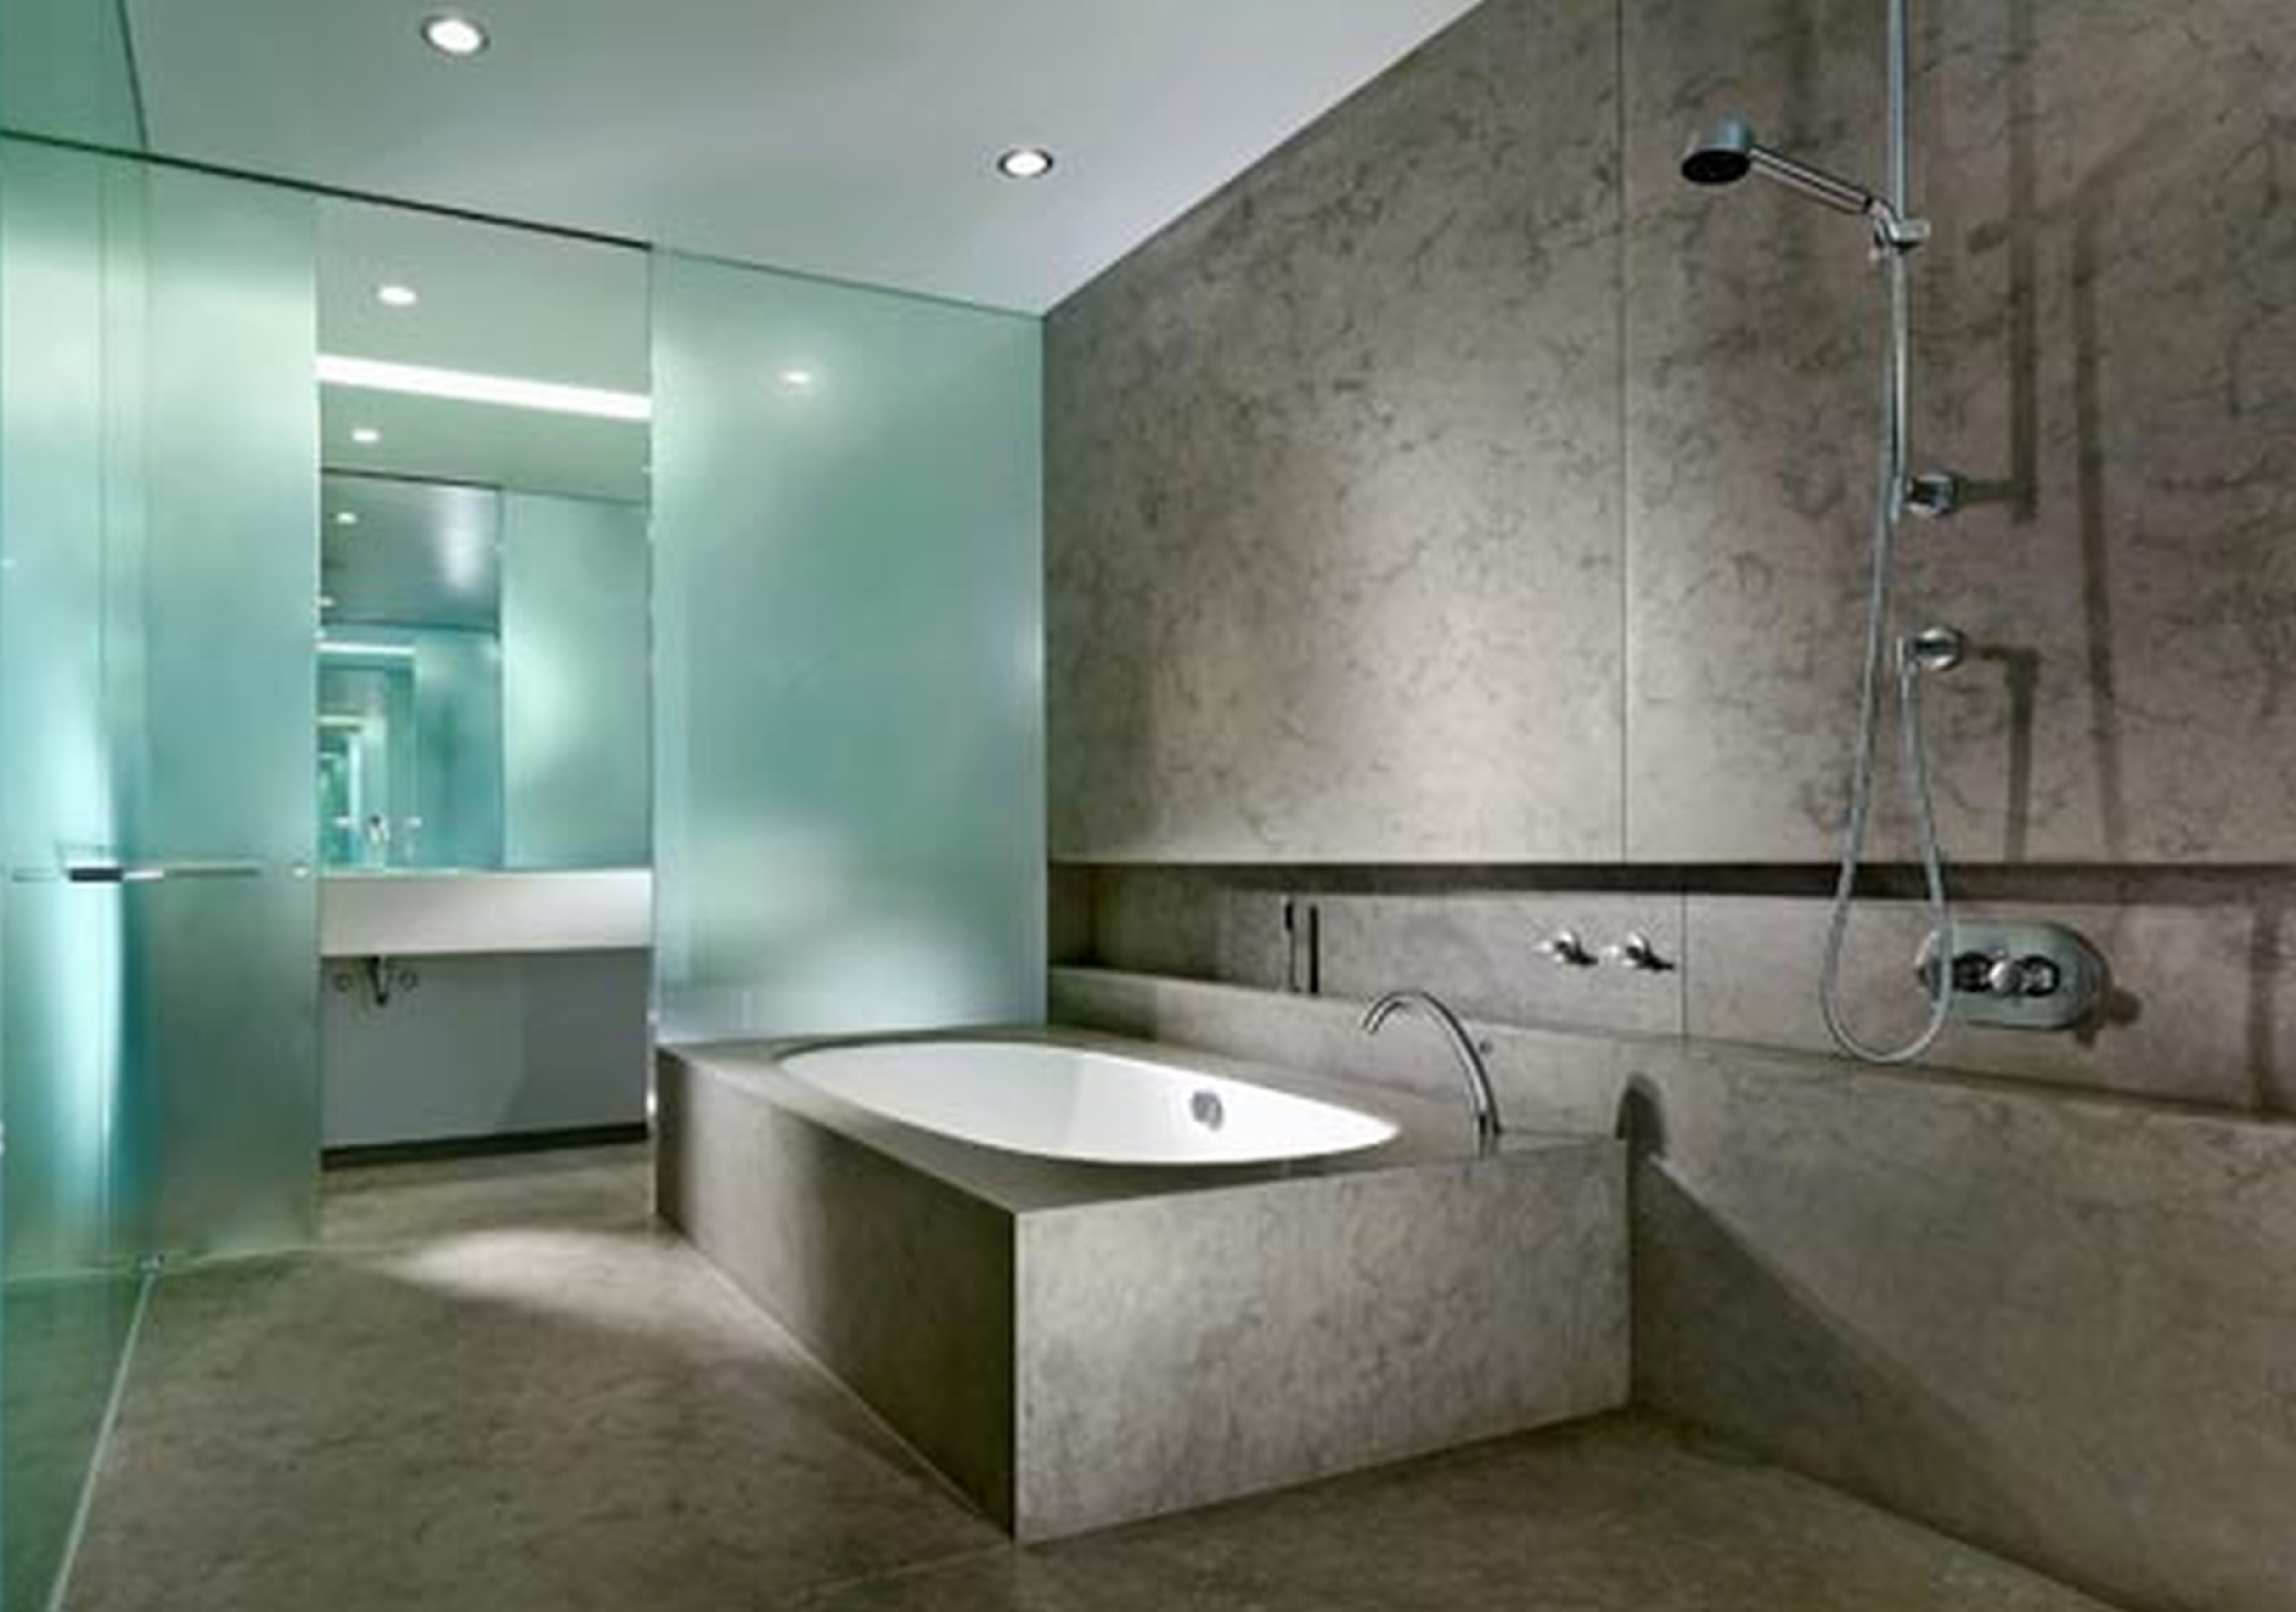 Bathroom Design App Lovely Bathroom Designs App Elegant Download 3d Bathroom Design tool Architecture